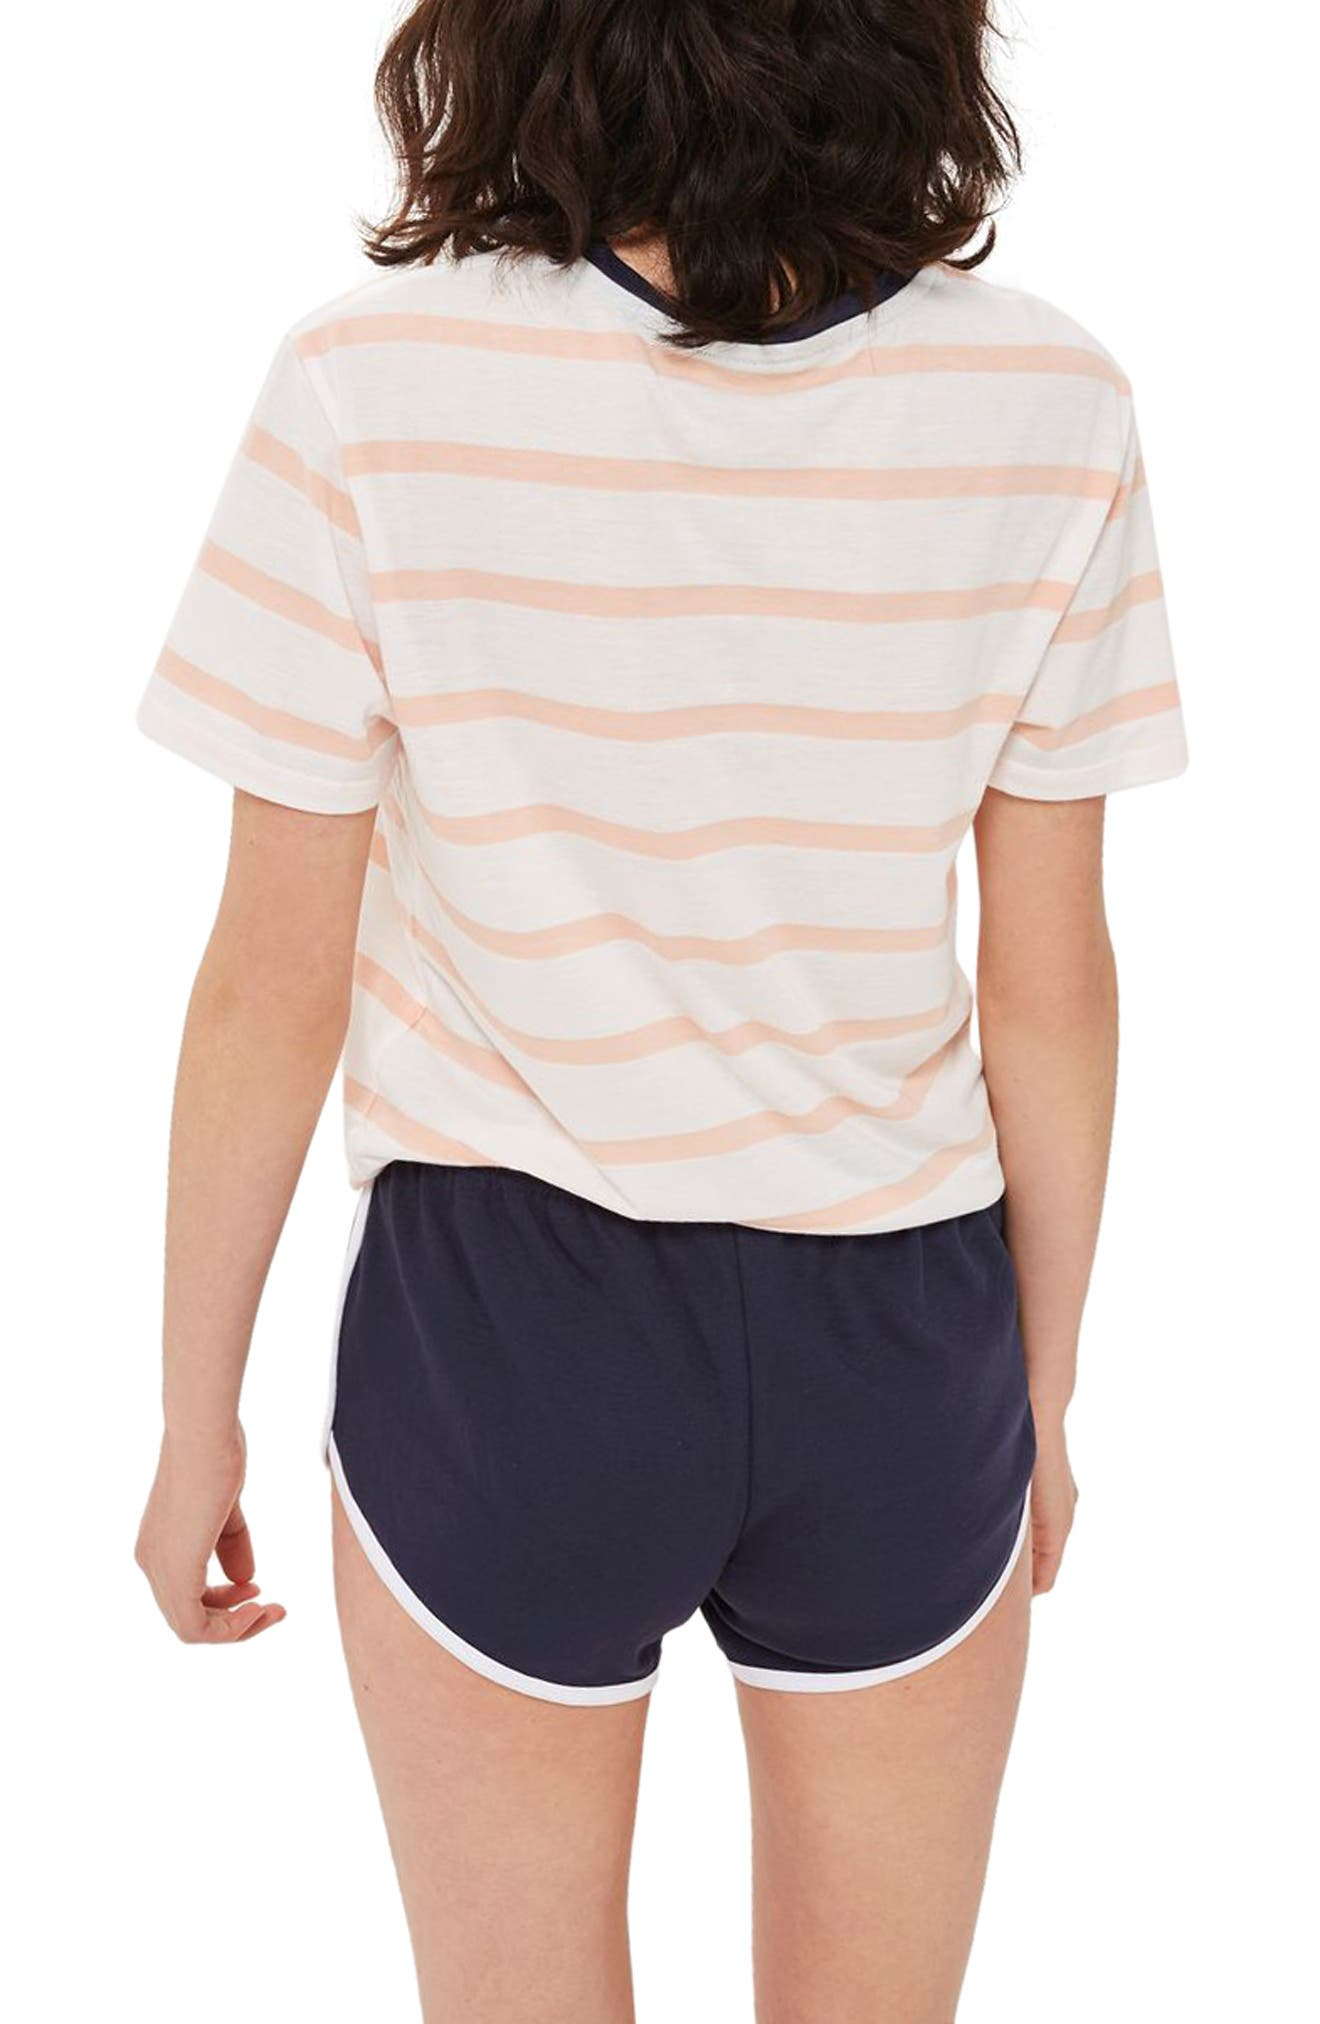 Lazy Days Pajamas,                             Alternate thumbnail 2, color,                             White Multi